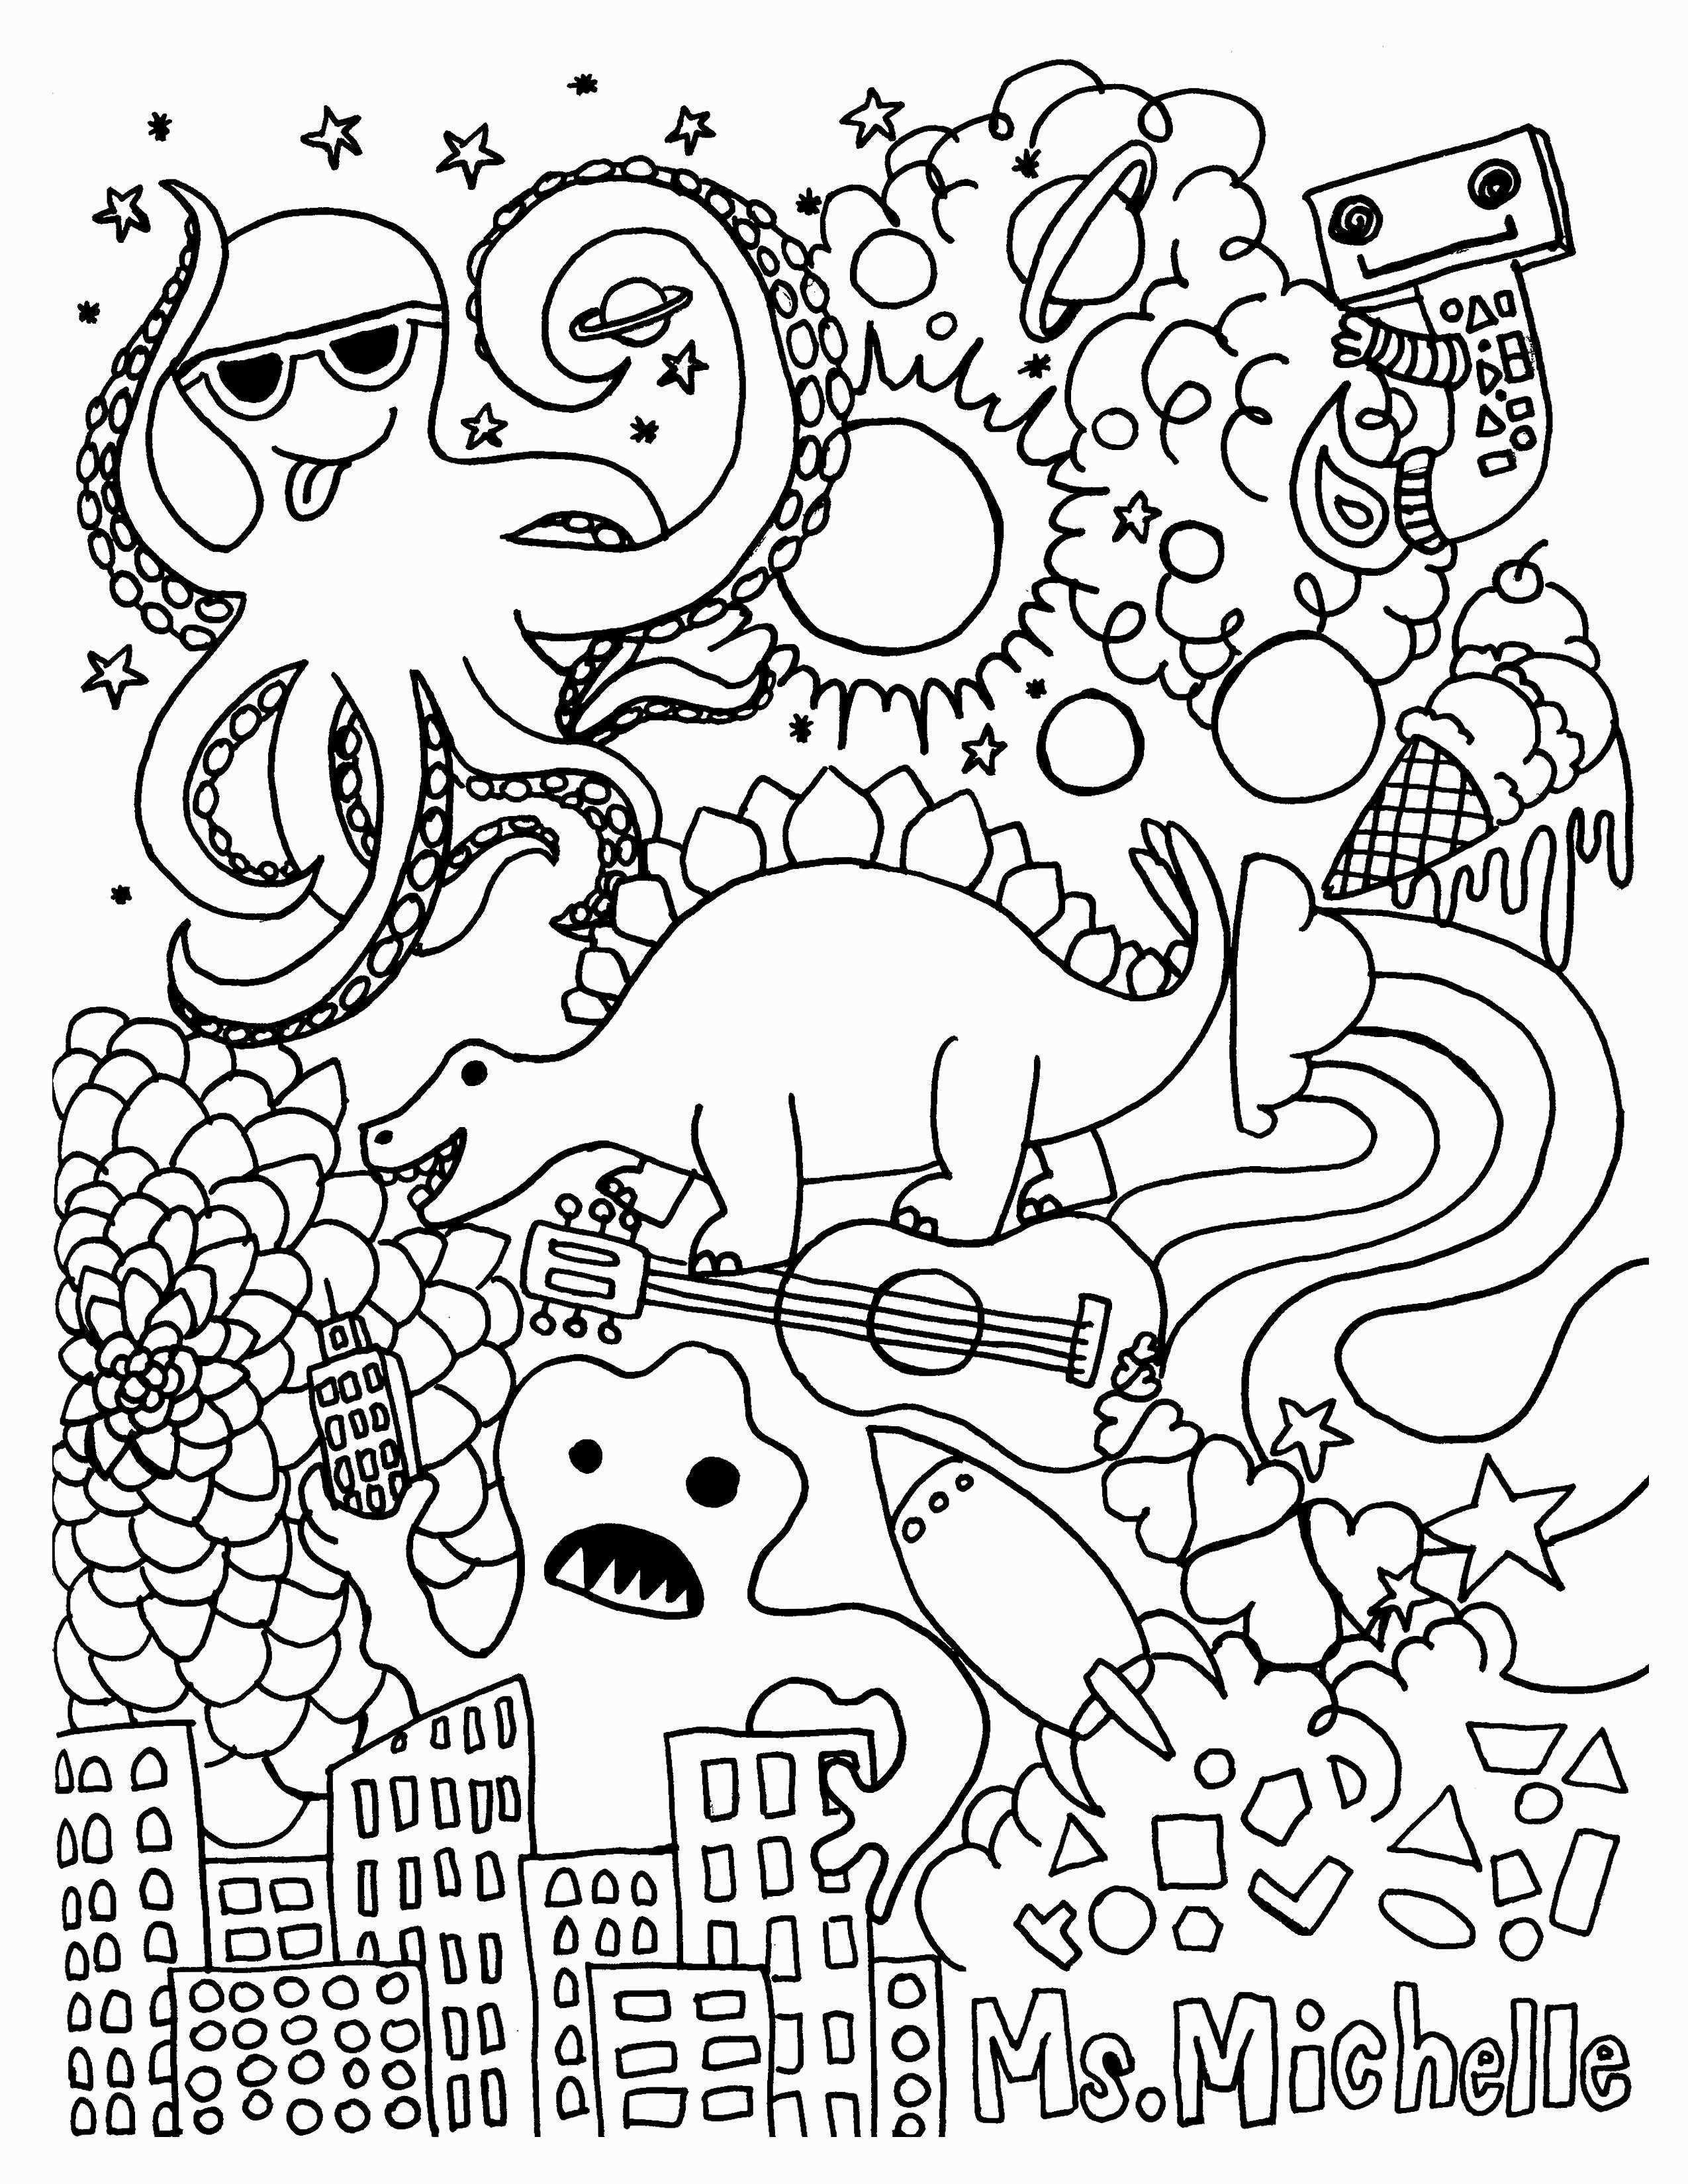 Ausmalbild Ninjago Weihnachten Inspirierend Of Ninjago Lego Coloring Pages Sabadaphnecottage Bild